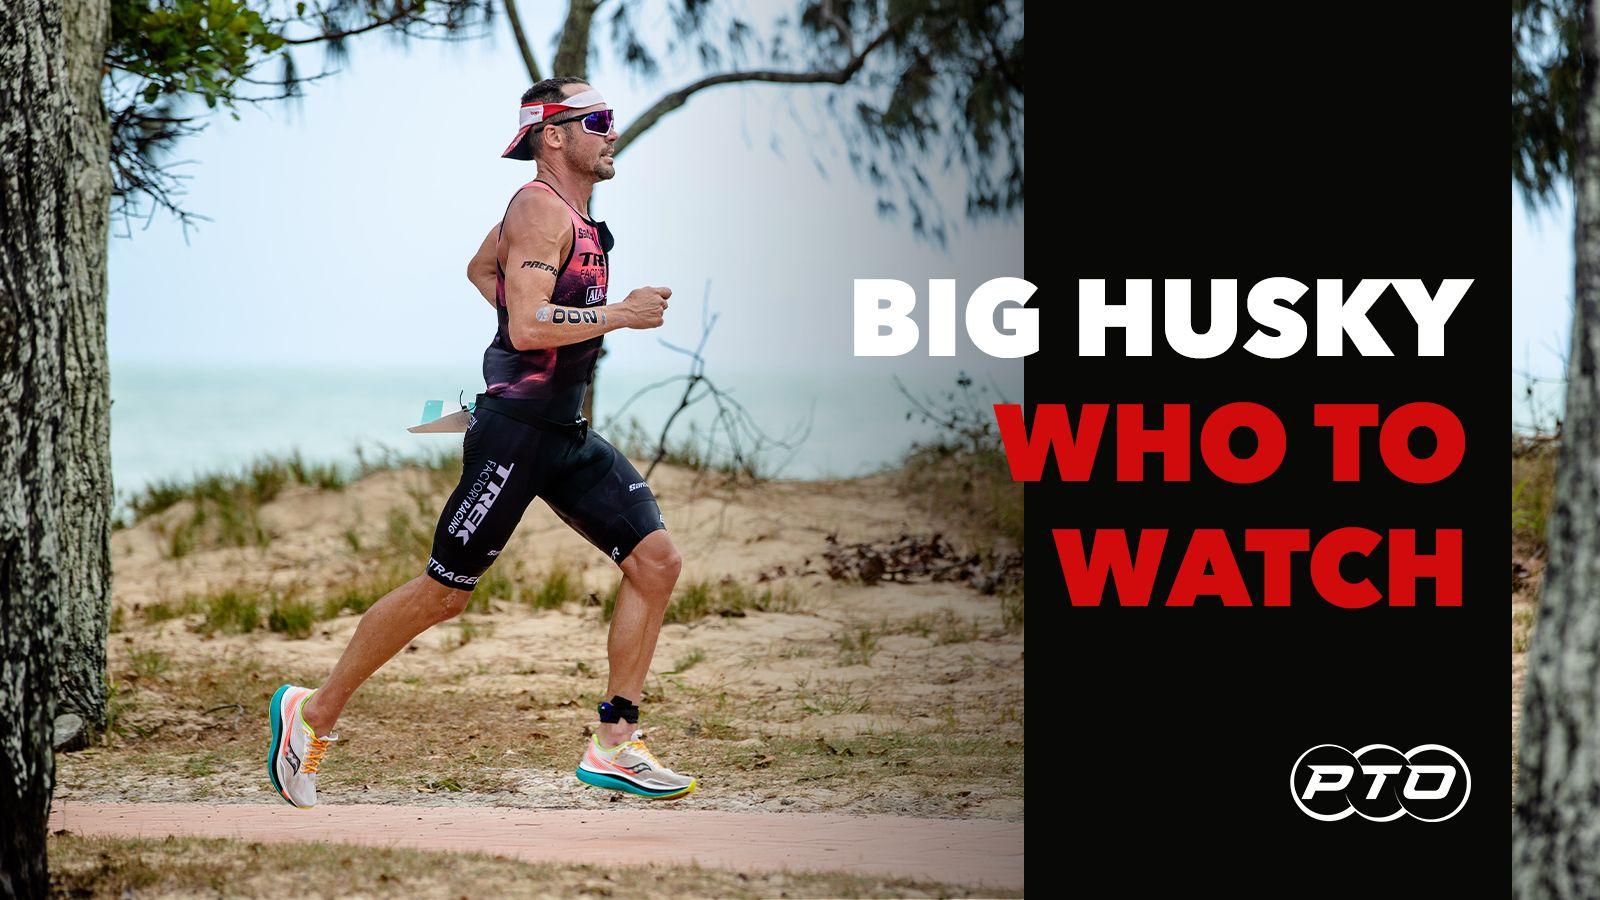 Big Husky Triathlon: Five PTO stars to watch